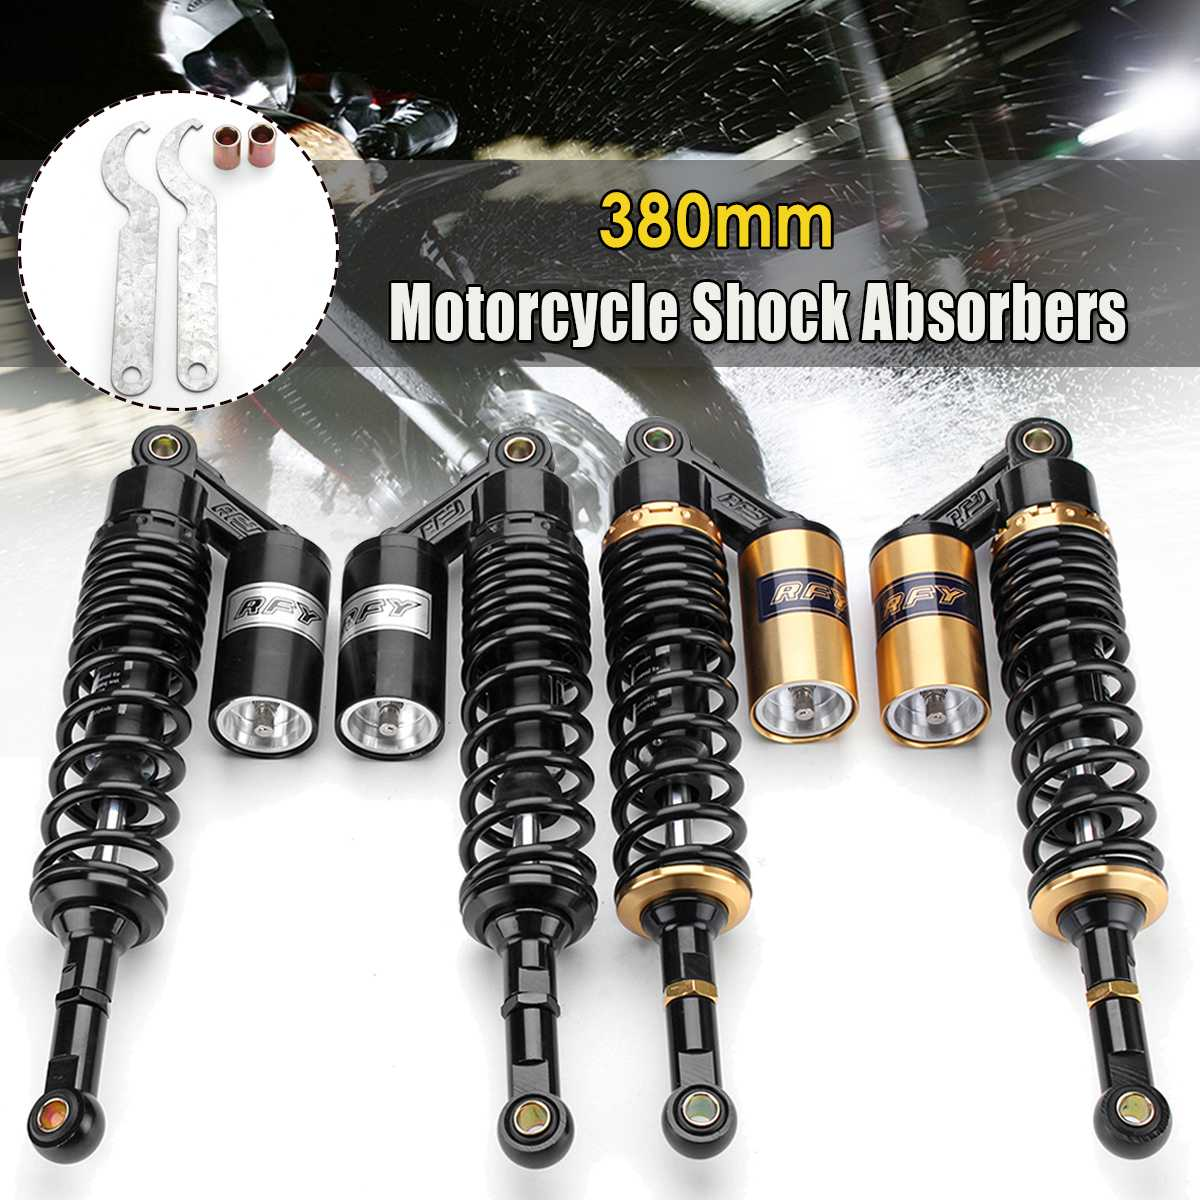 Pair 15 380mm Rear Air Shock Absorbers Suspension For ATV Motorcycle Dirt Bike